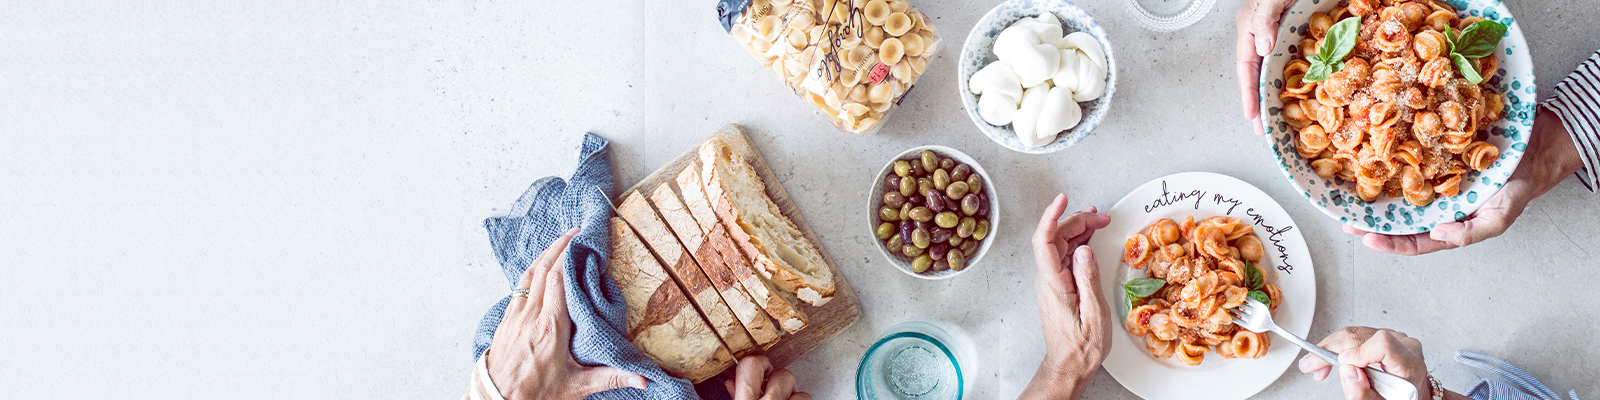 Pasta Garofalo - The Garofalo World